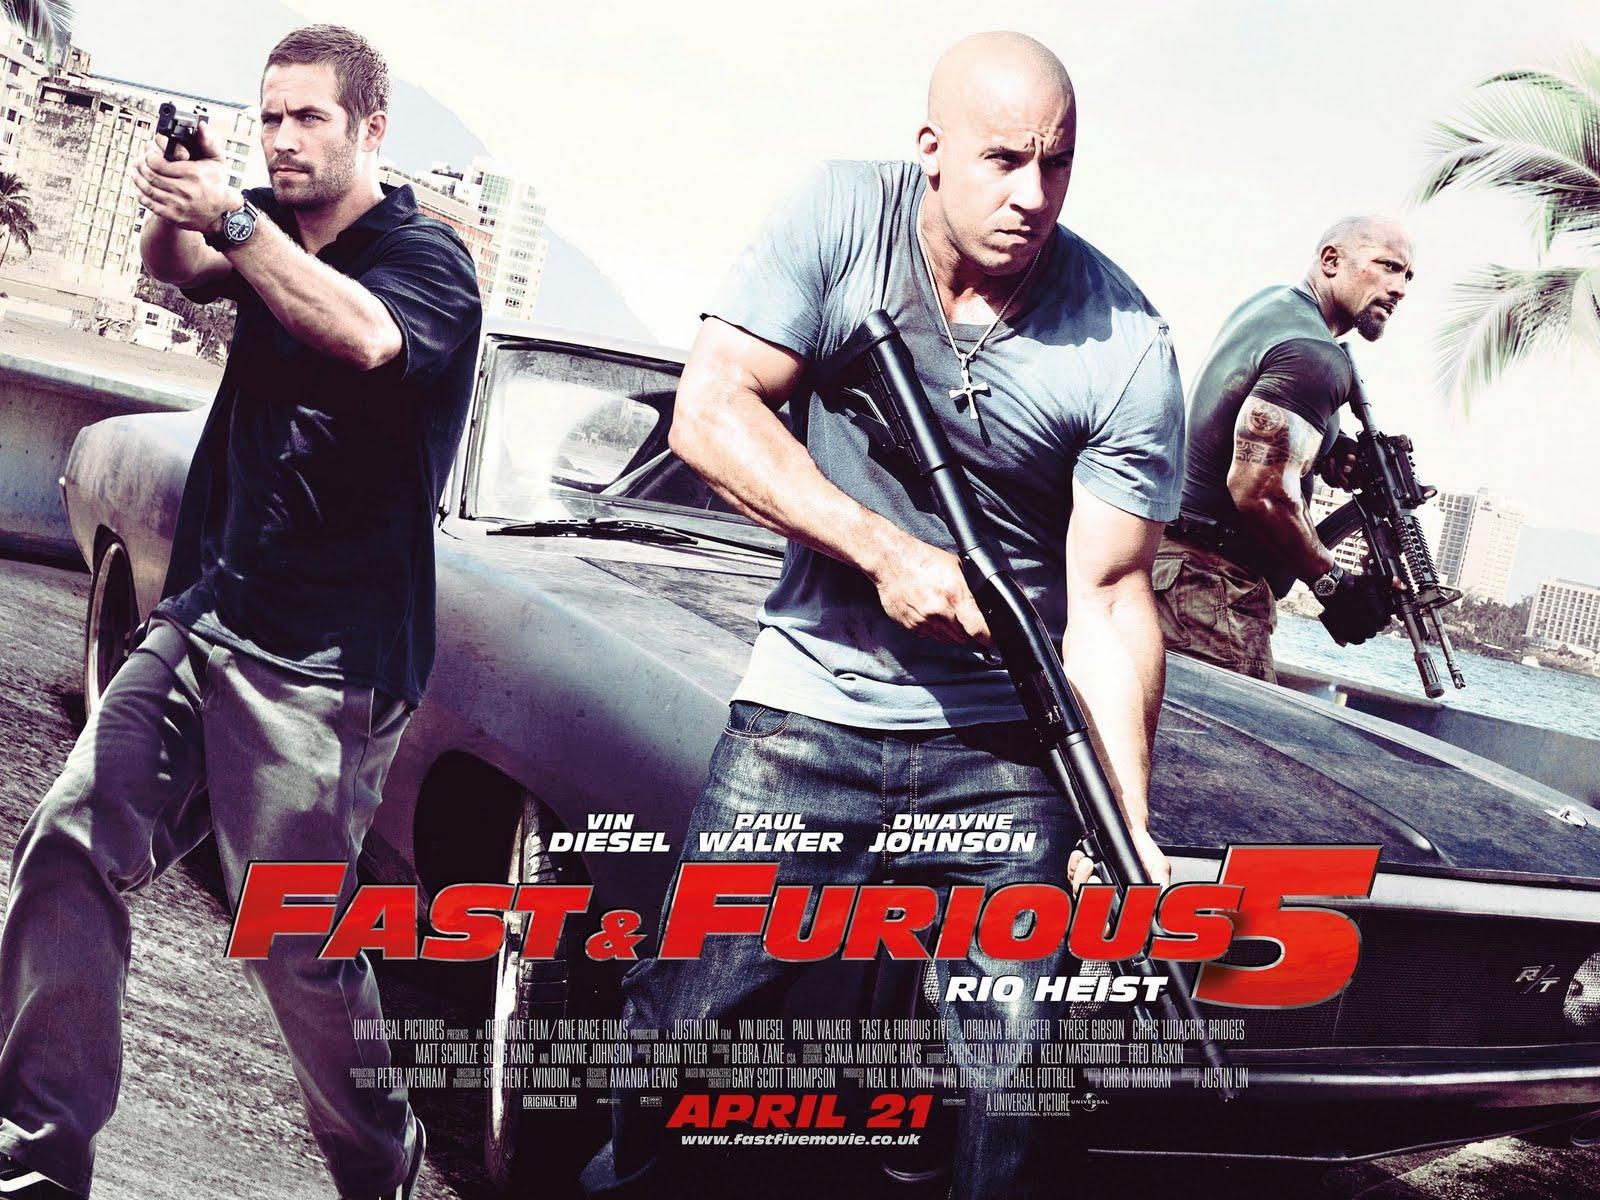 Fast five full movie download free in hindi hd utorrent karmalost.